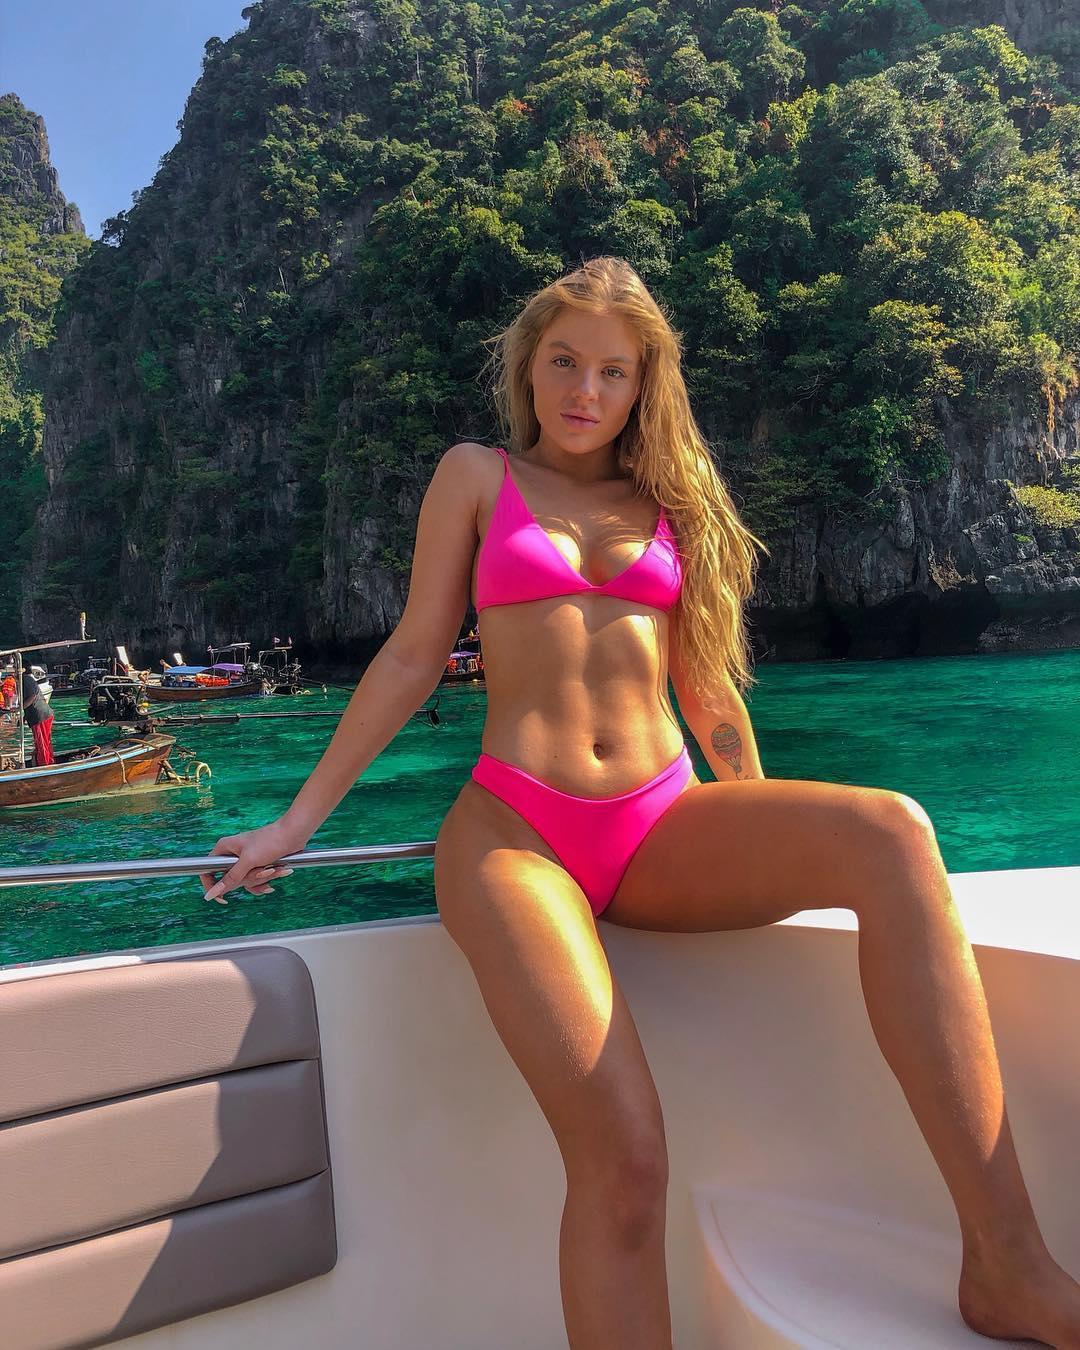 As fotos mais sexy de Luísa Sonza no Instagram 39